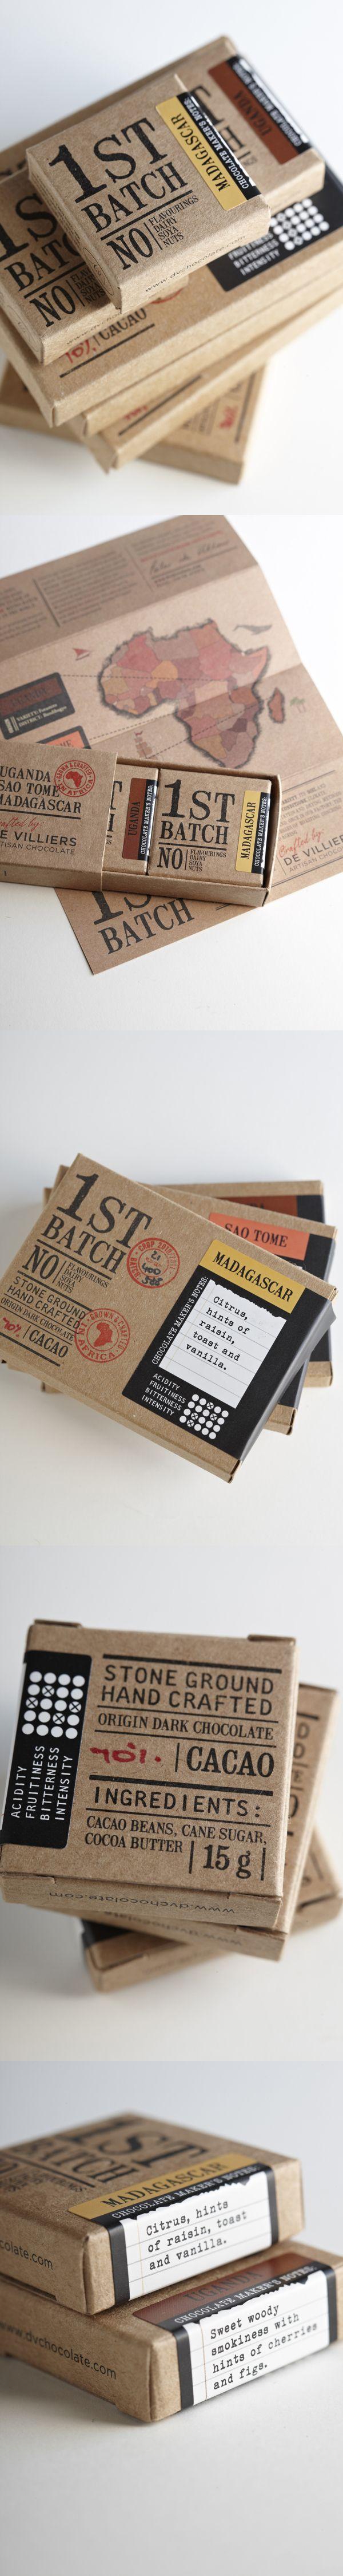 1st Batch Chocolates | Jane Says via Behance